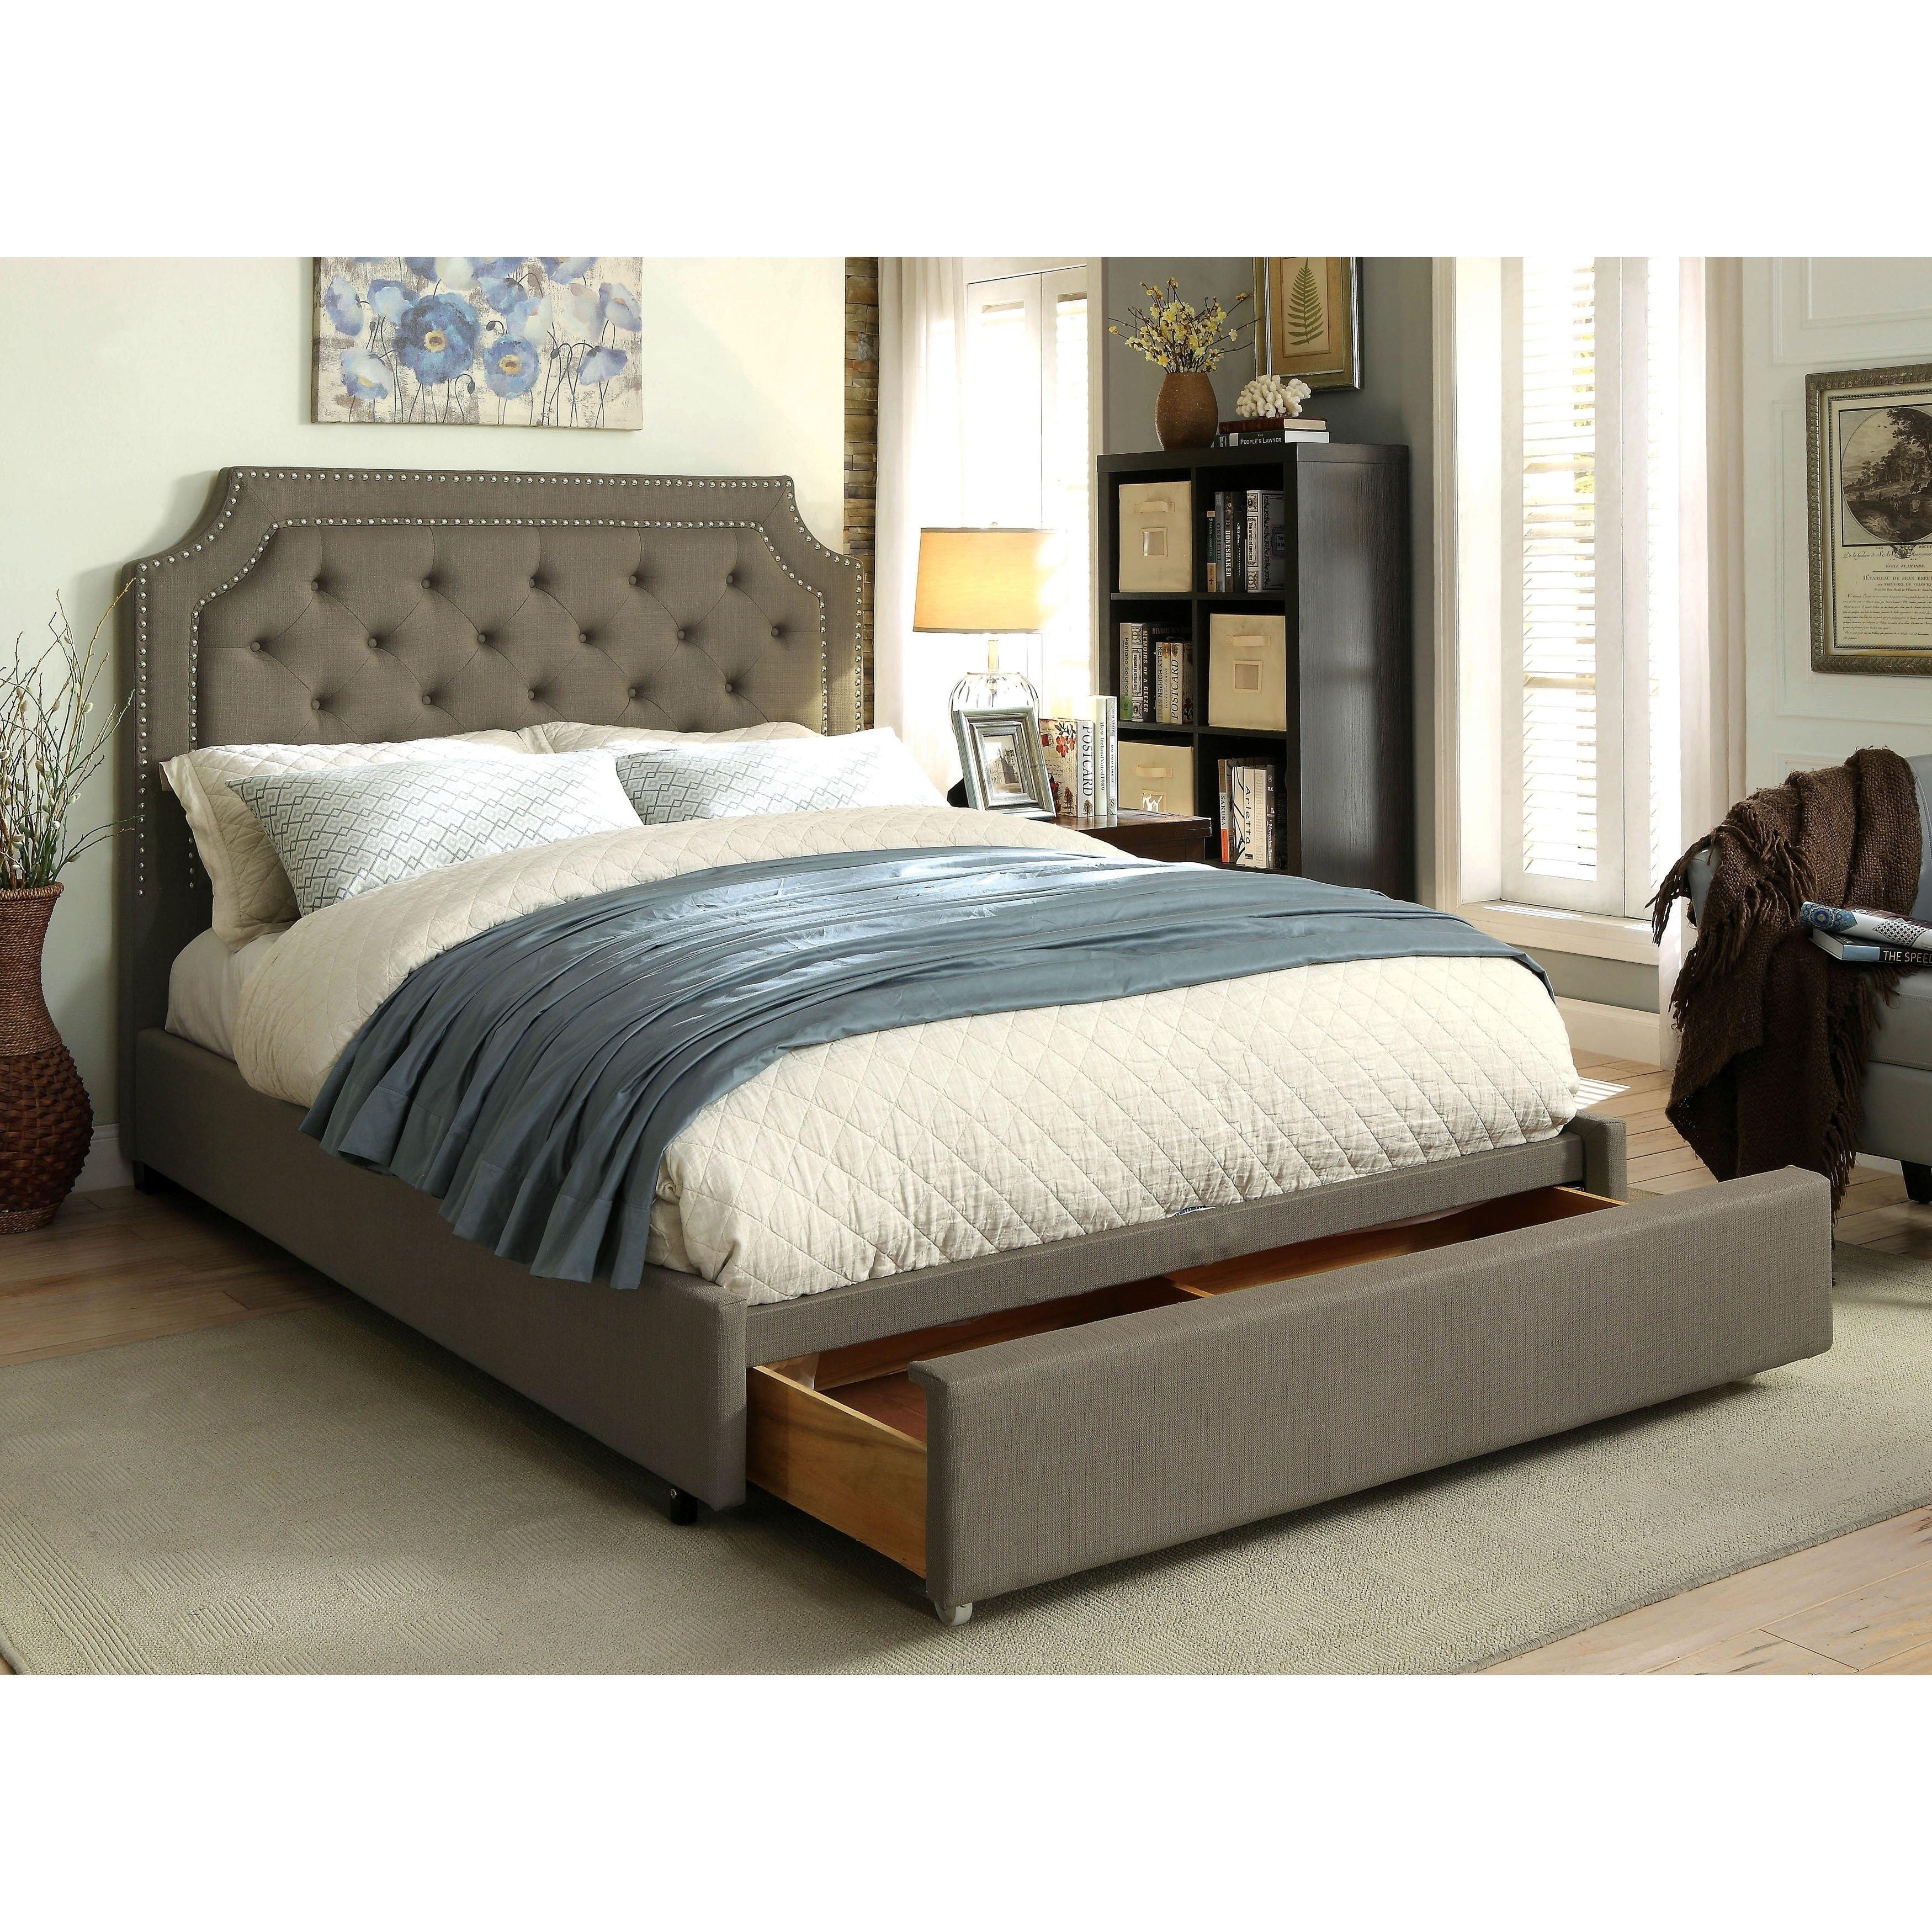 Furniture of America Fraiser Contemporary Grey Tufted Lin...